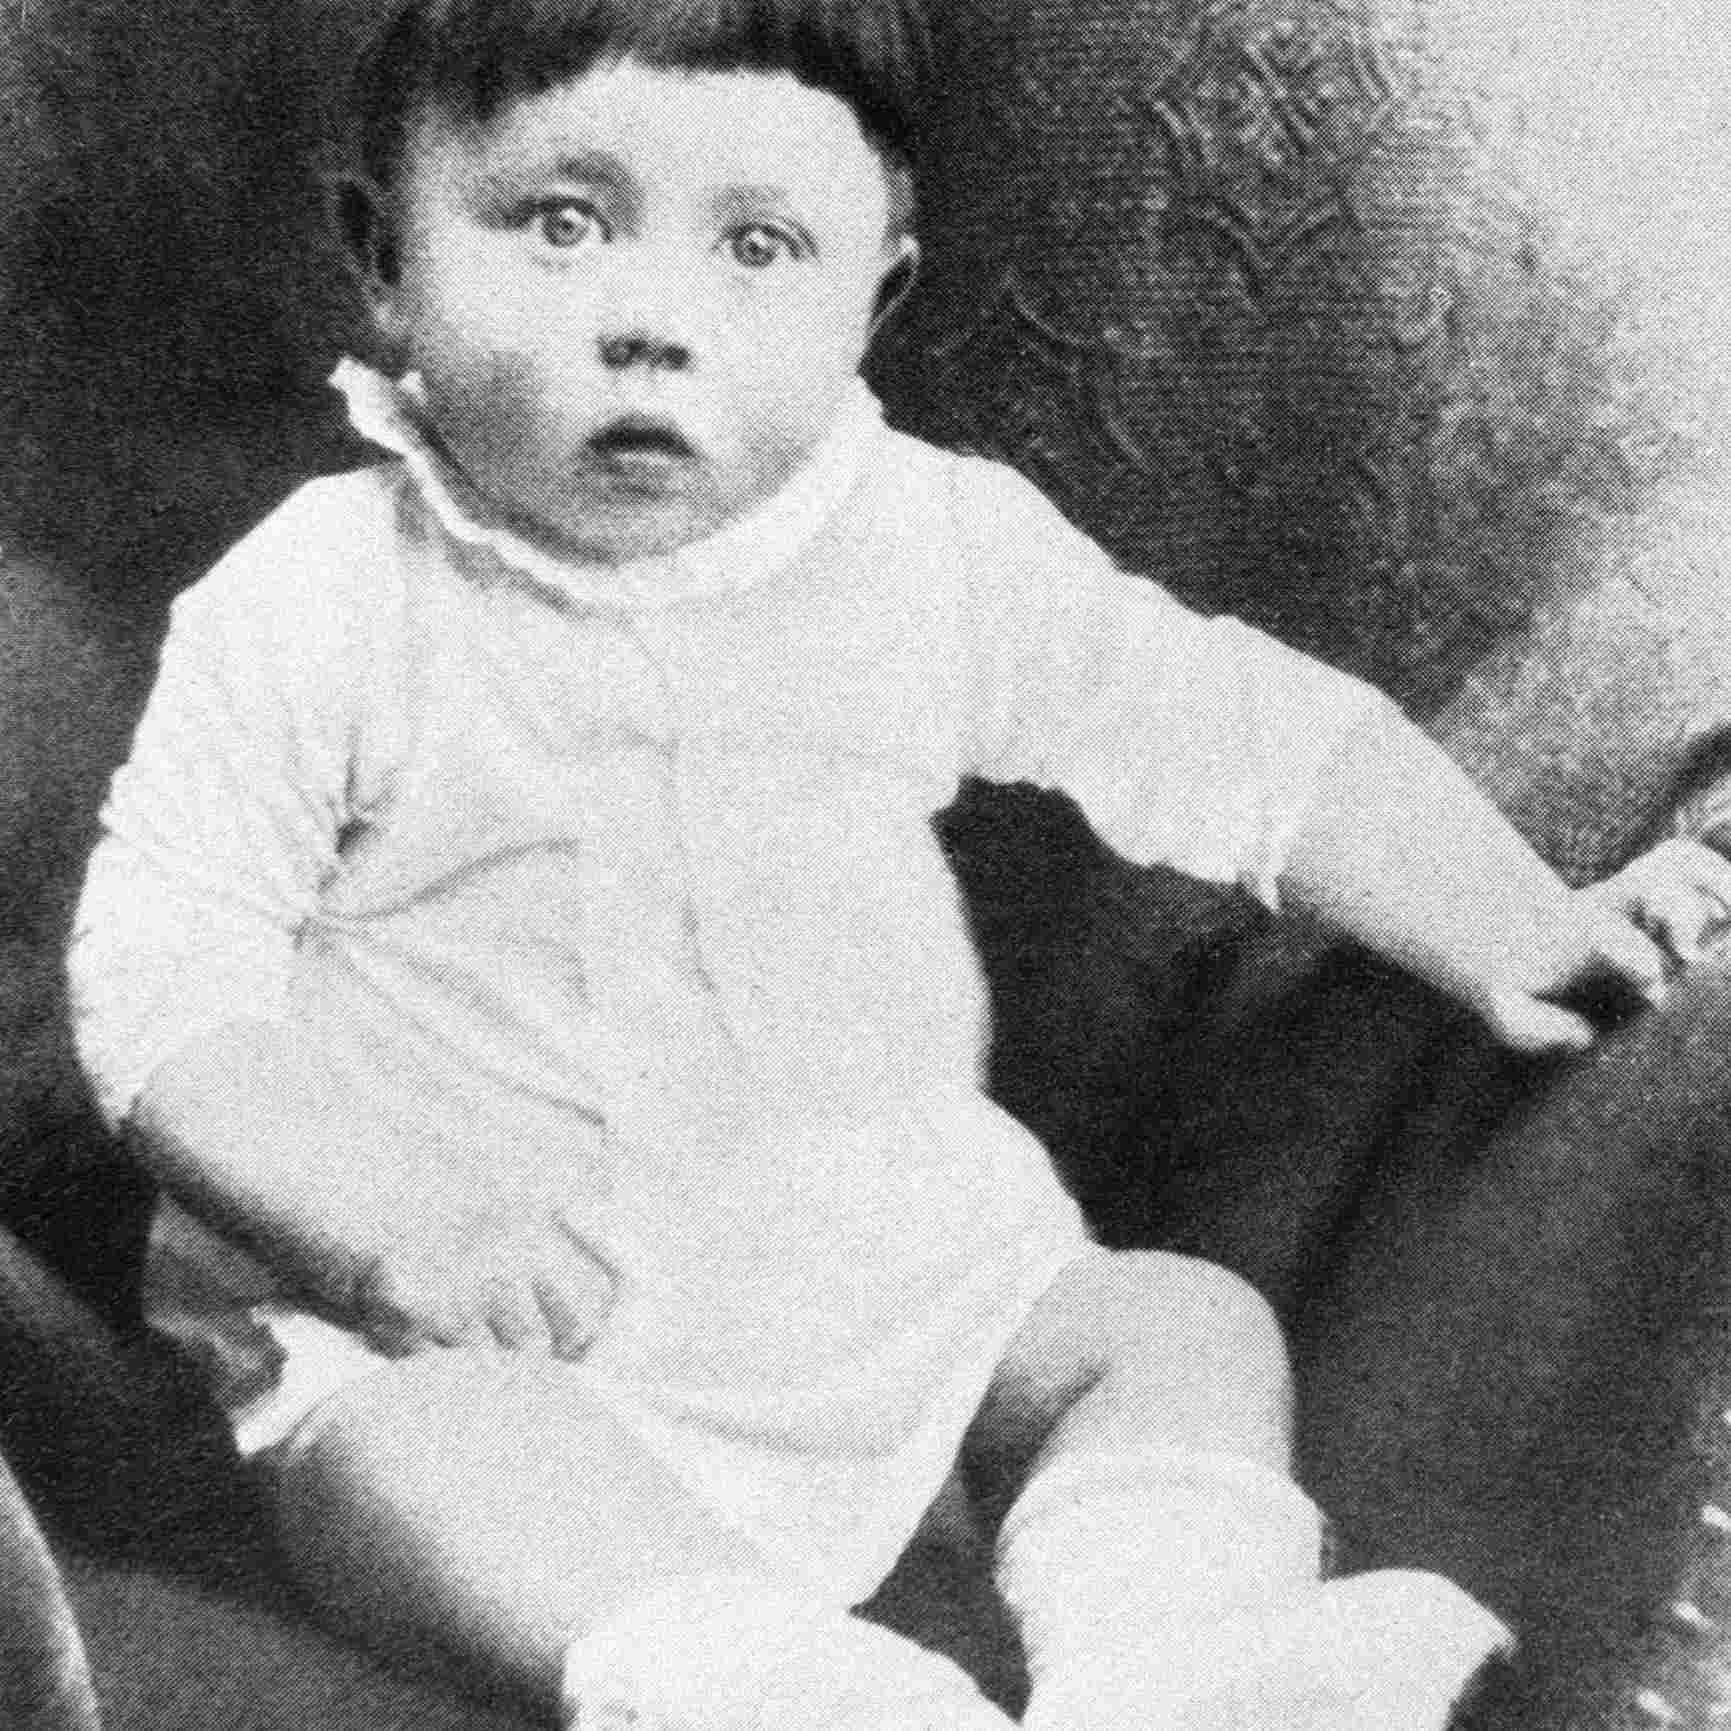 Baby portrait of Adolf Hitler